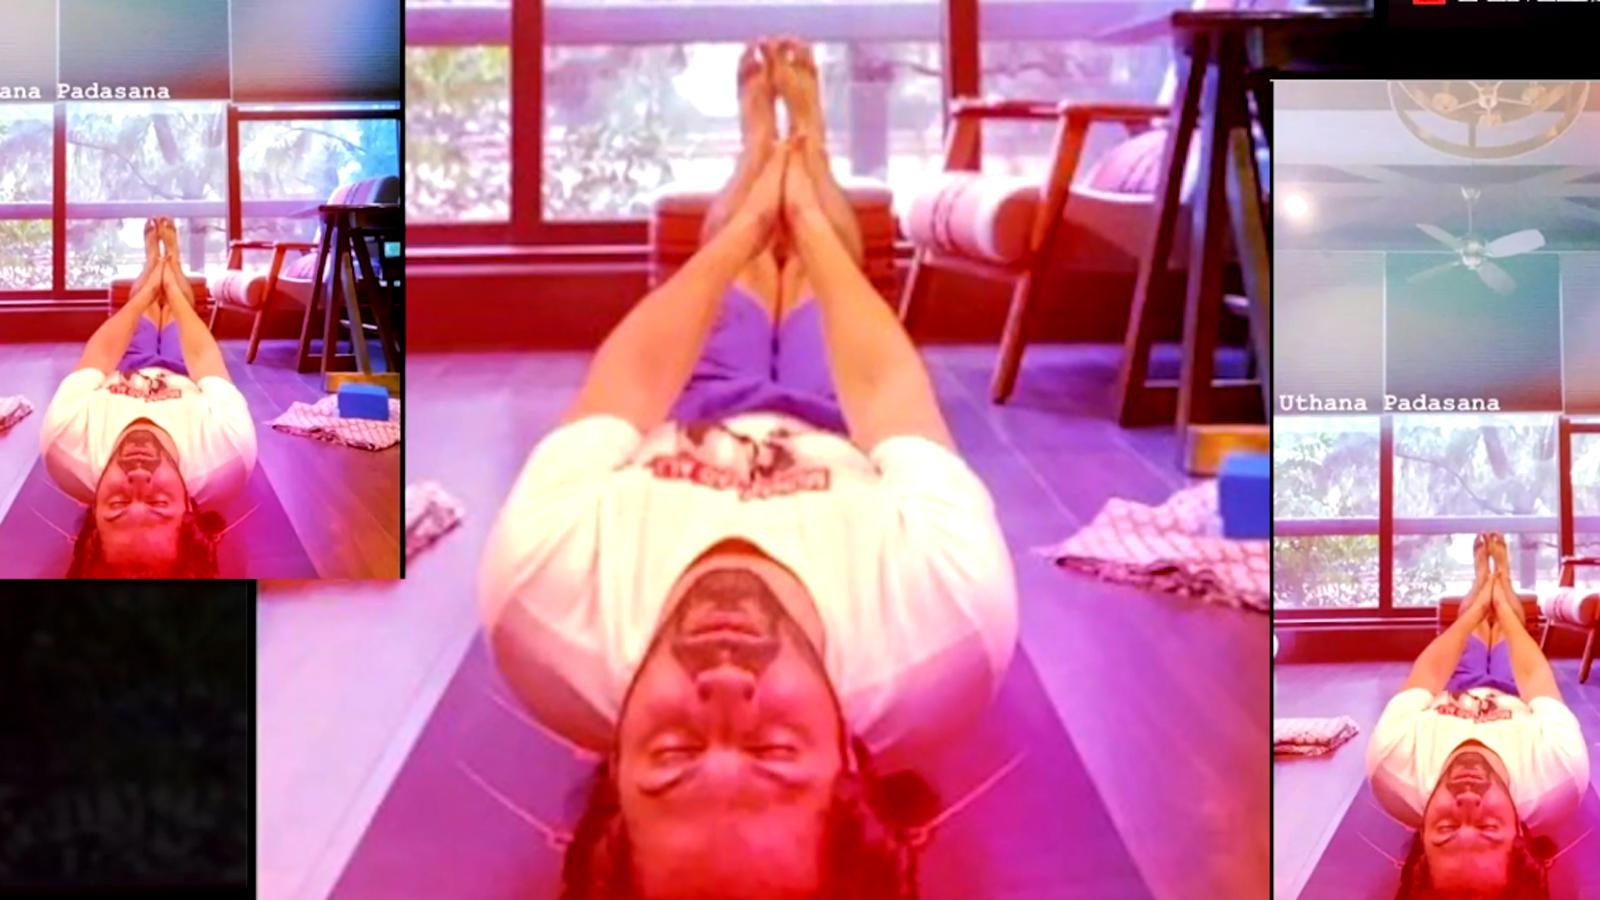 varun-dhawan-raises-fitness-bar-to-next-level-as-he-nails-uttana-padasana-yoga-pose-like-a-pro